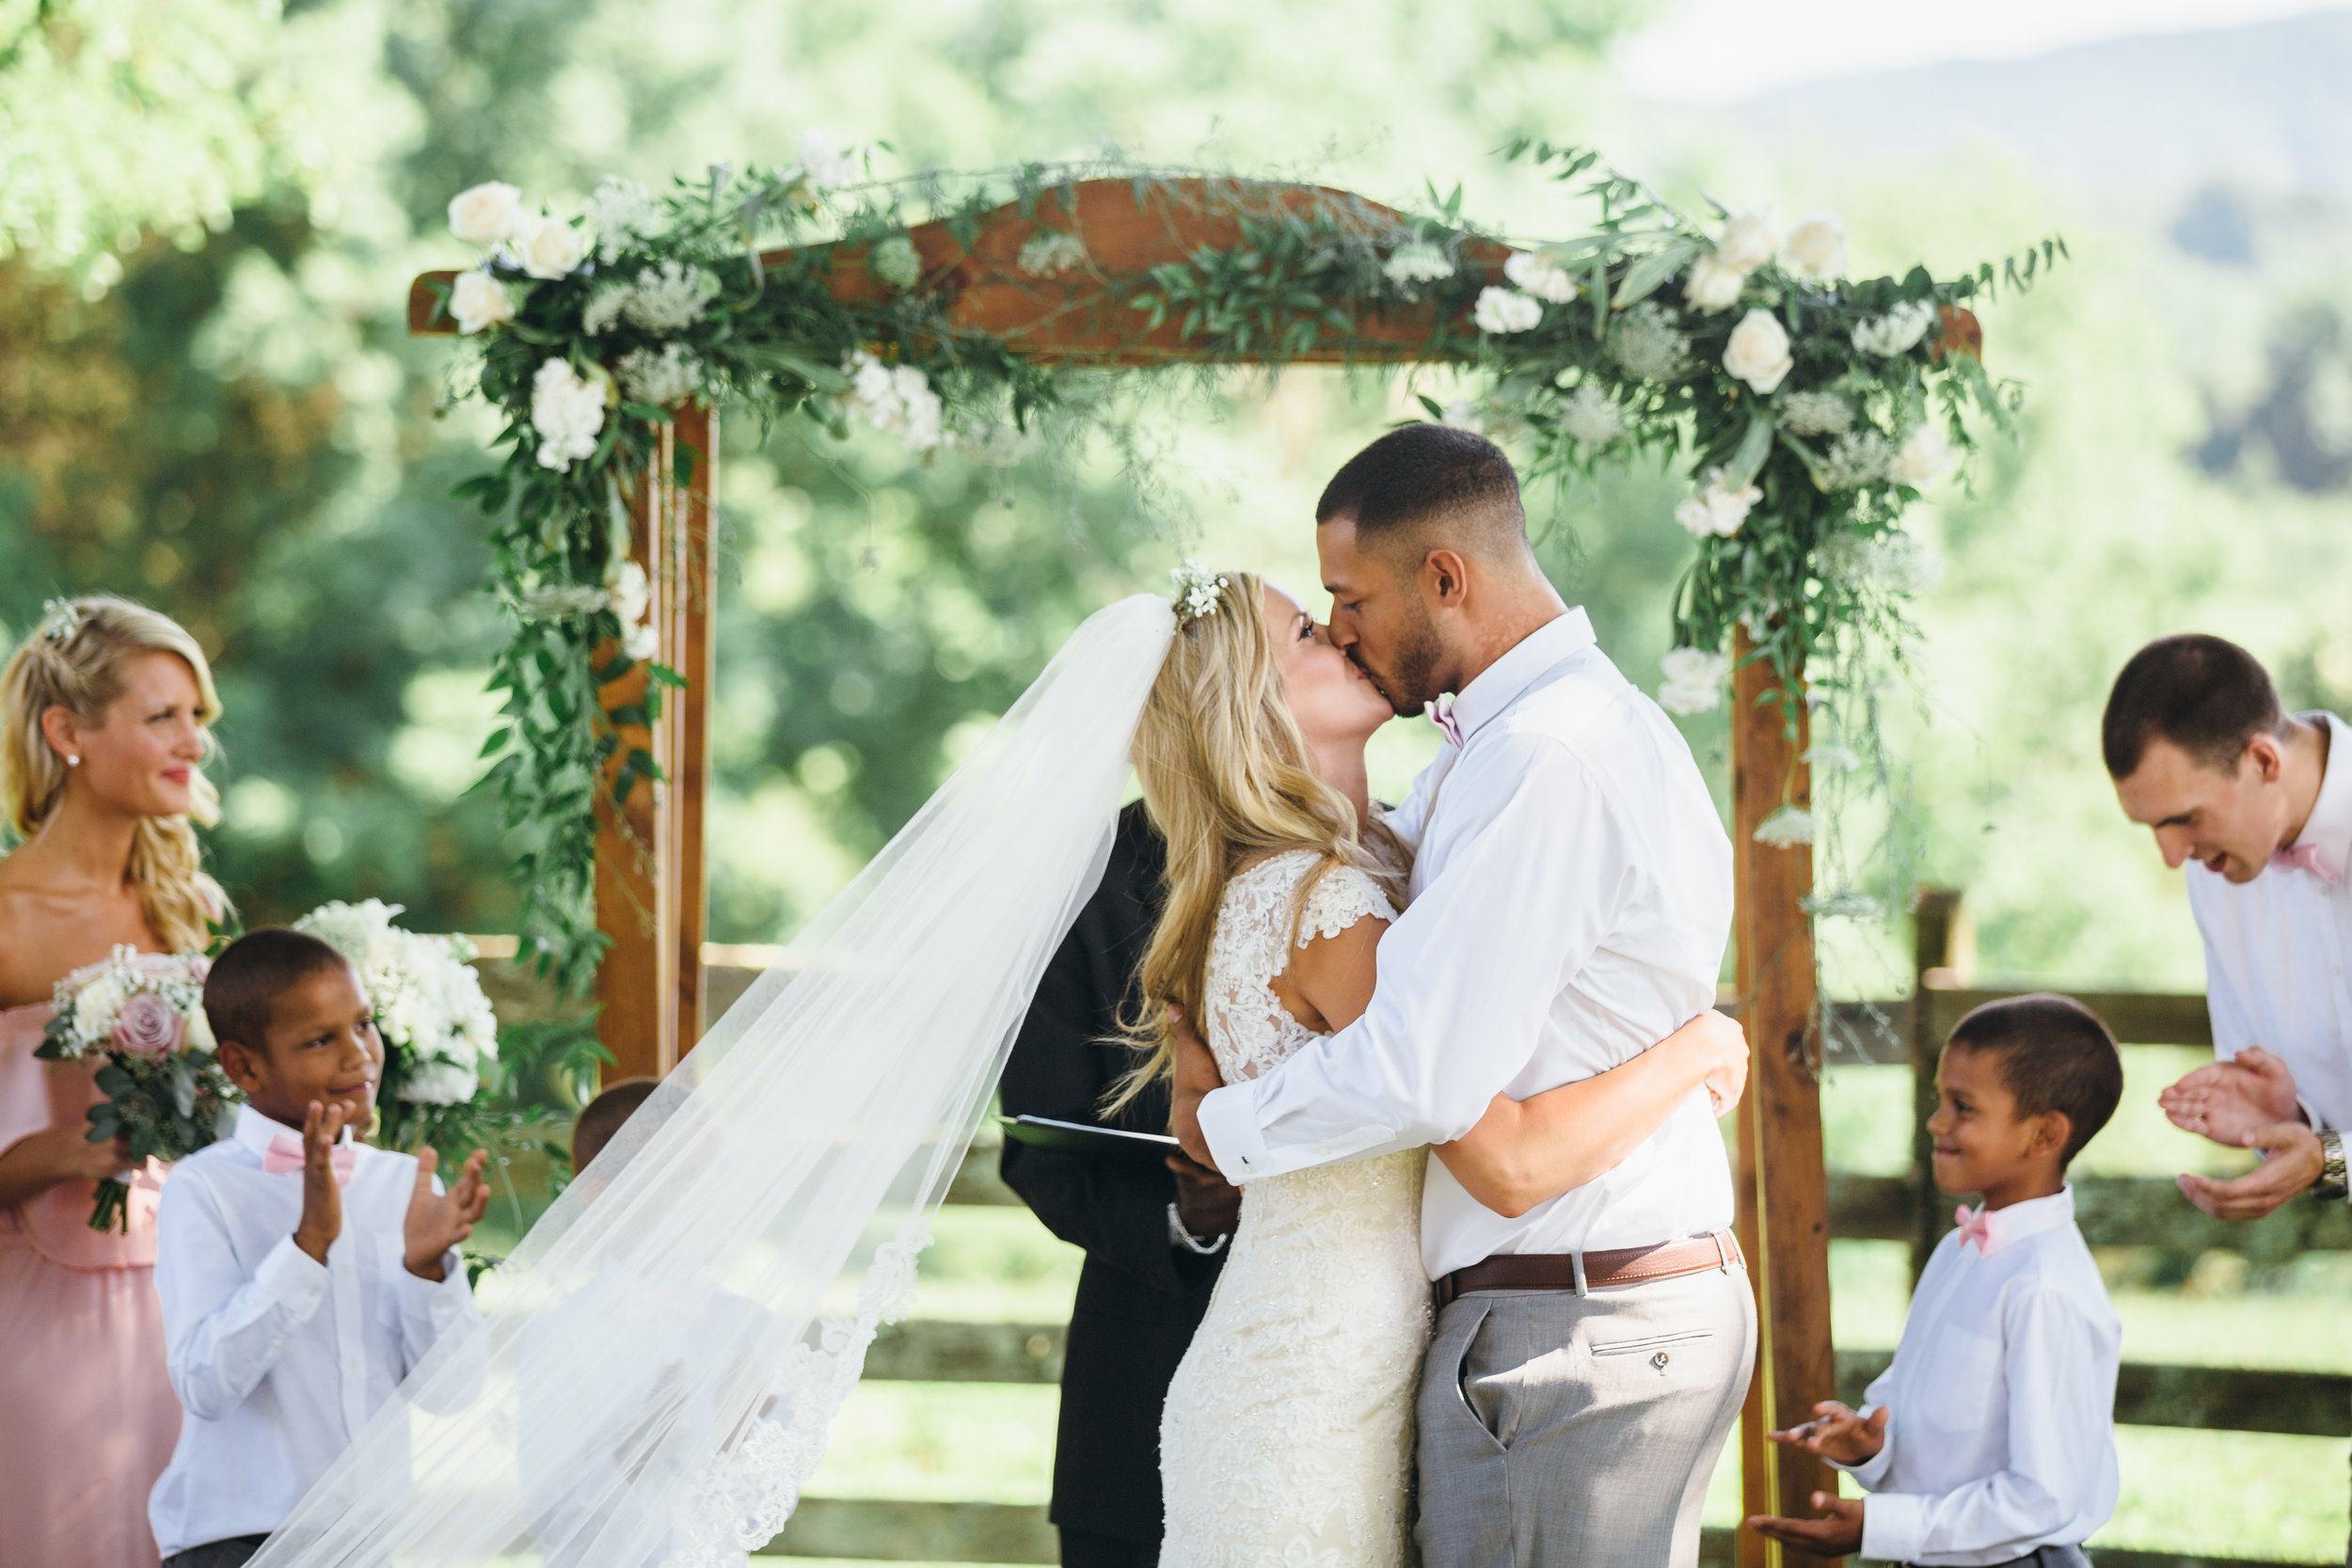 Lynchburg Wedding Photographer; Lynchburg Photographer; Lynchburg Wedding; Sorella Farms Wedding; Virginia Wedding Photographer; Virginia Wedding-43.jpg